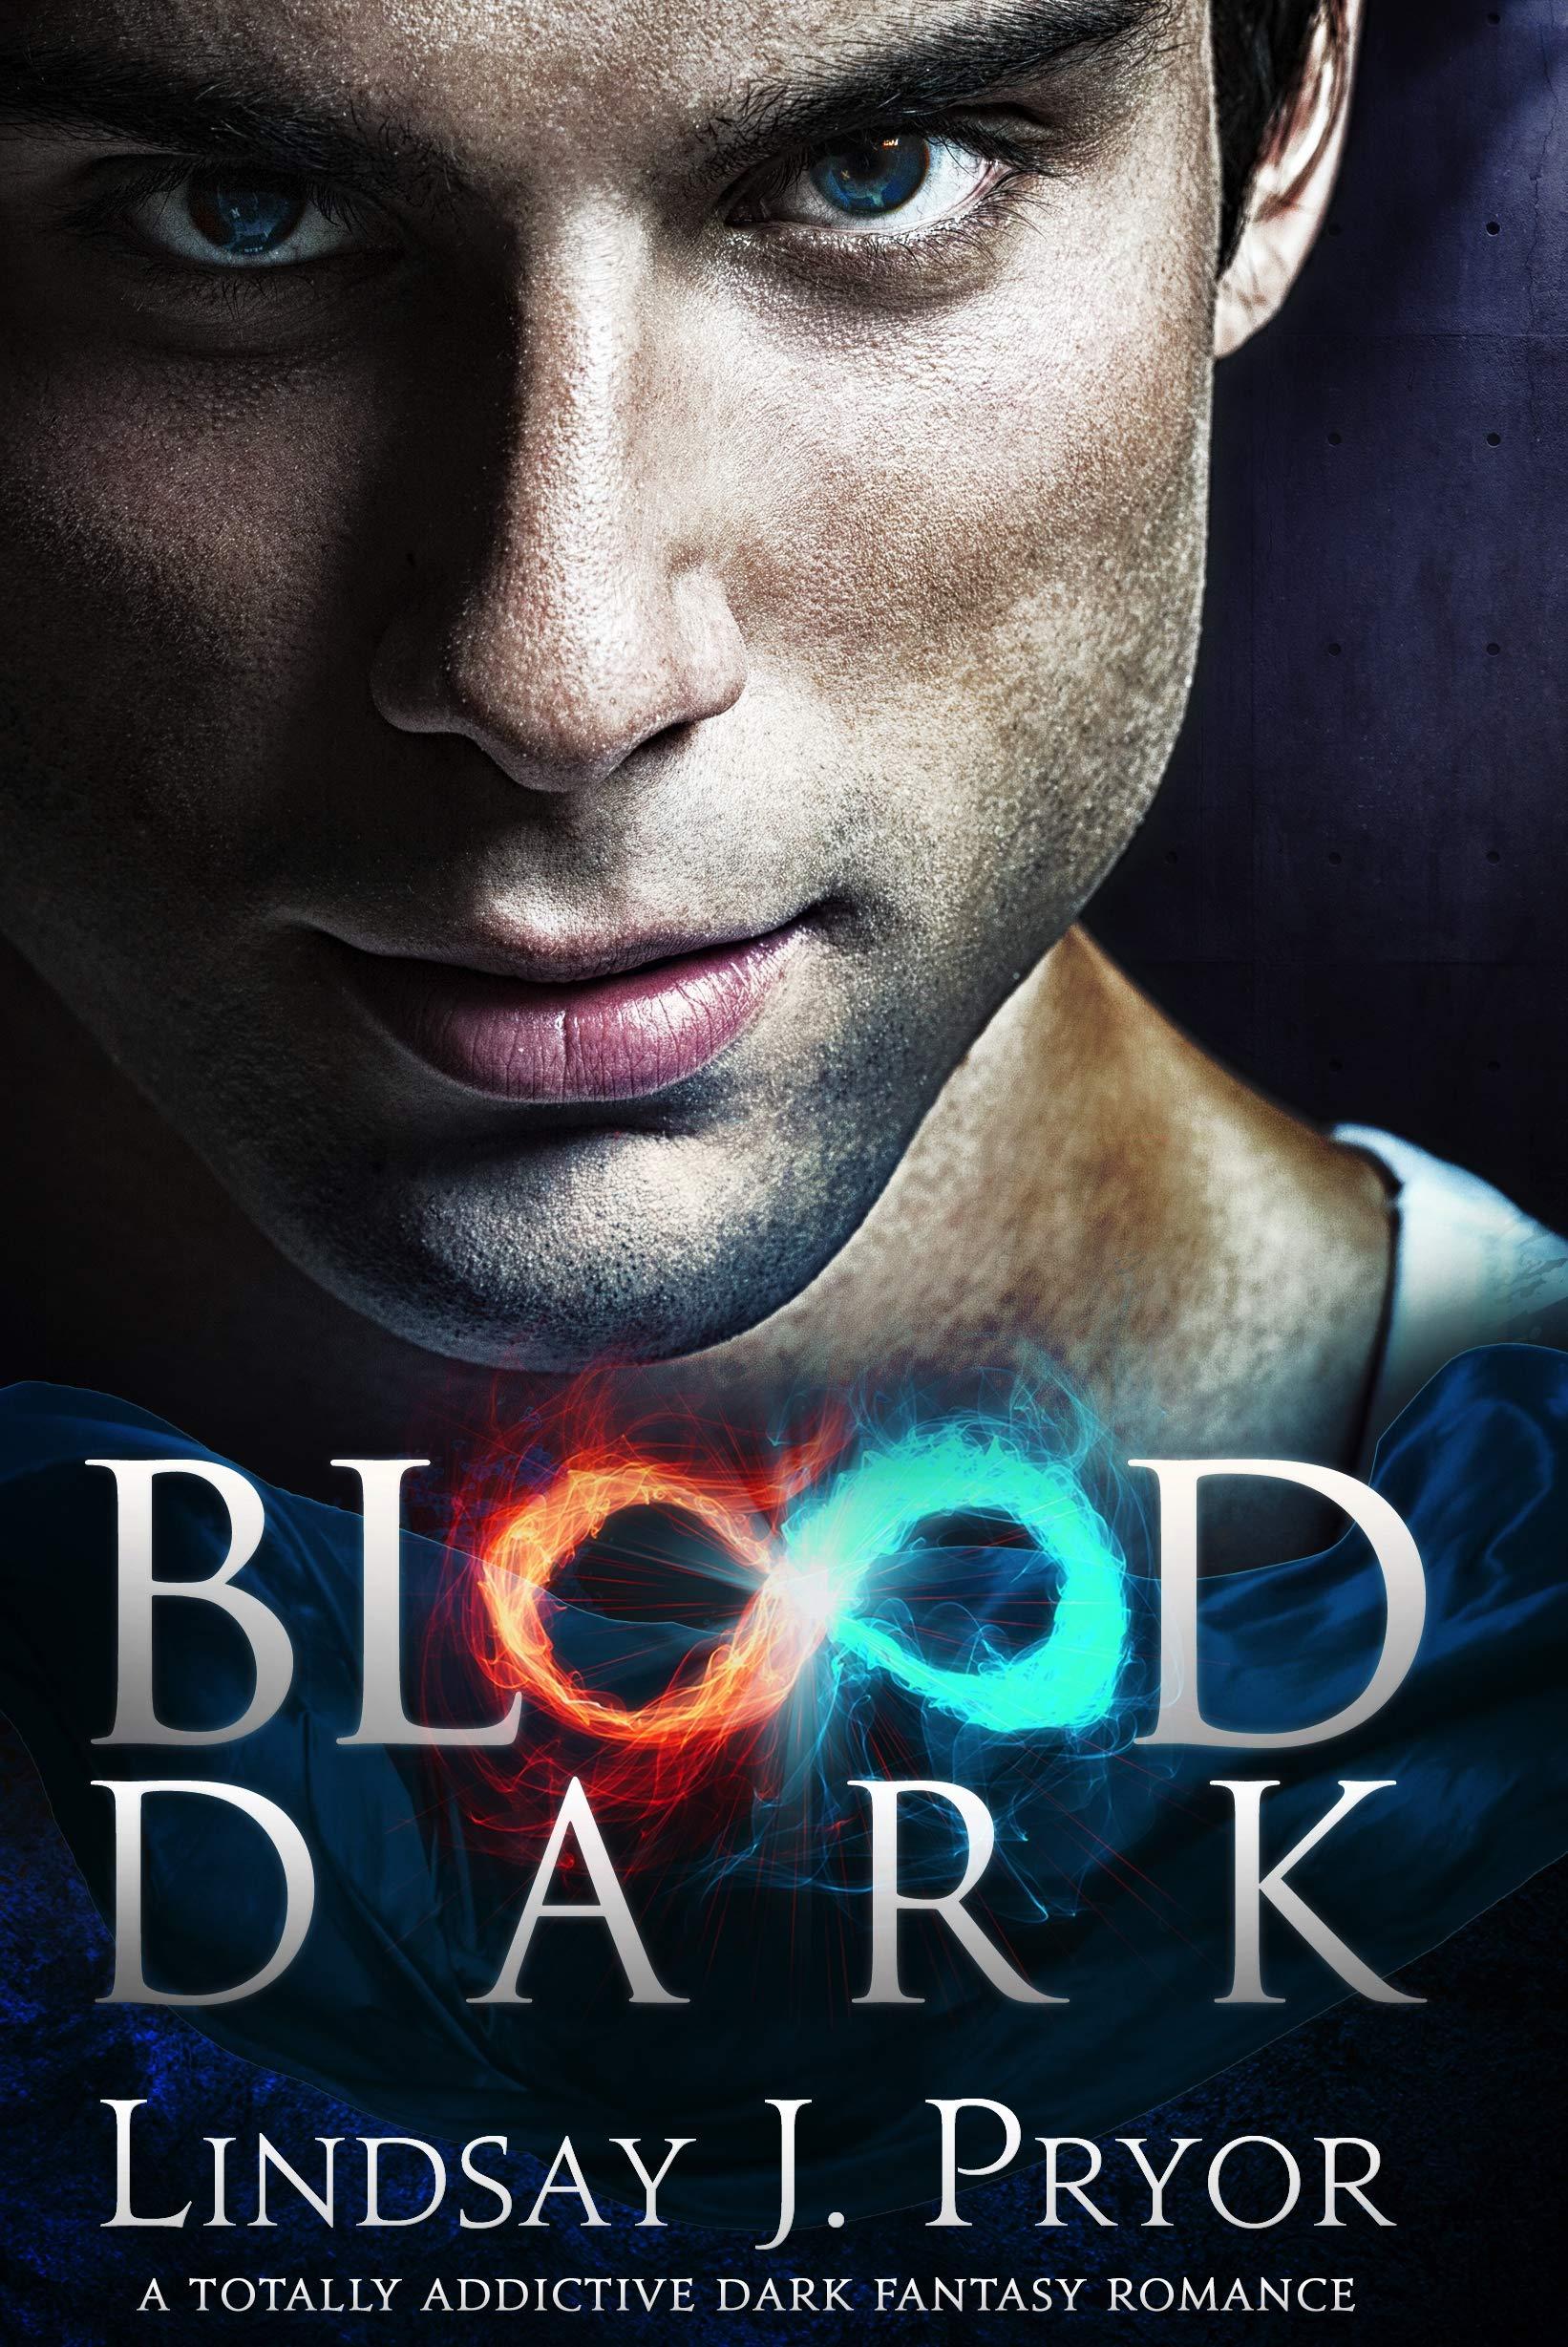 Blood Dark: A totally addictive dark fantasy romance (Blackthorn Book 5) (English Edition)